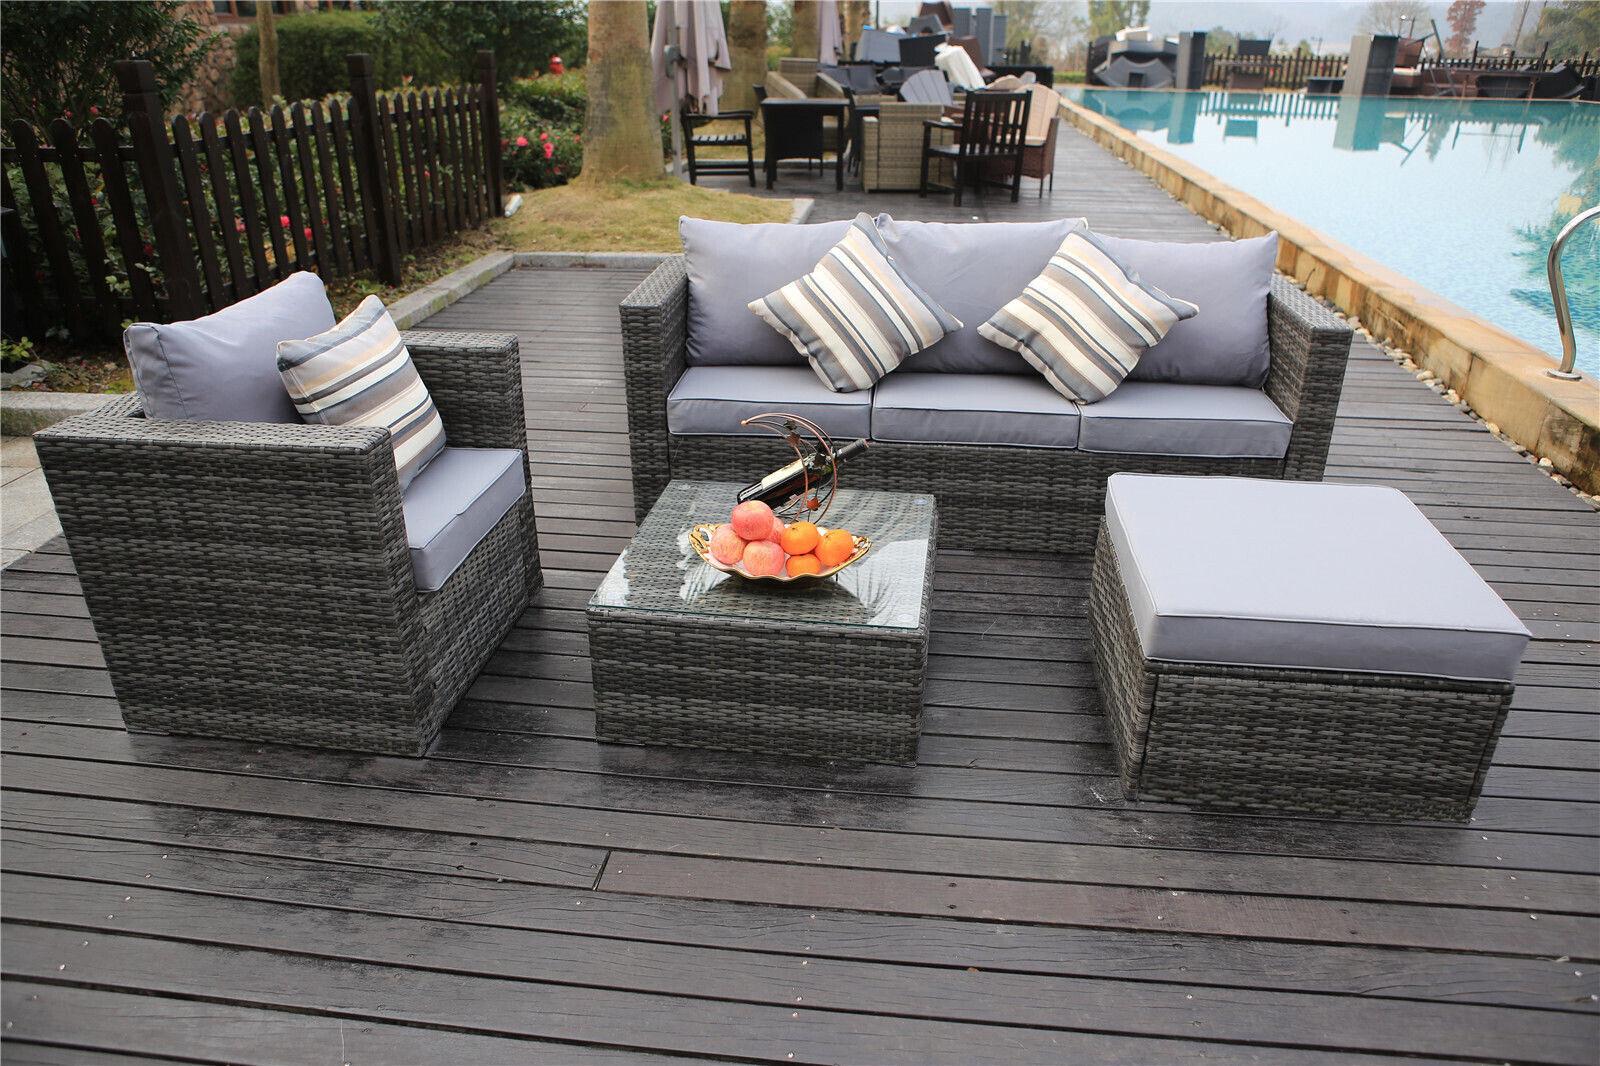 Garden Furniture - YAKOE RATTAN GARDEN FURNITURE SET SOFA TABLE CHAIRS GARDEN PATIO CONSERVATORY